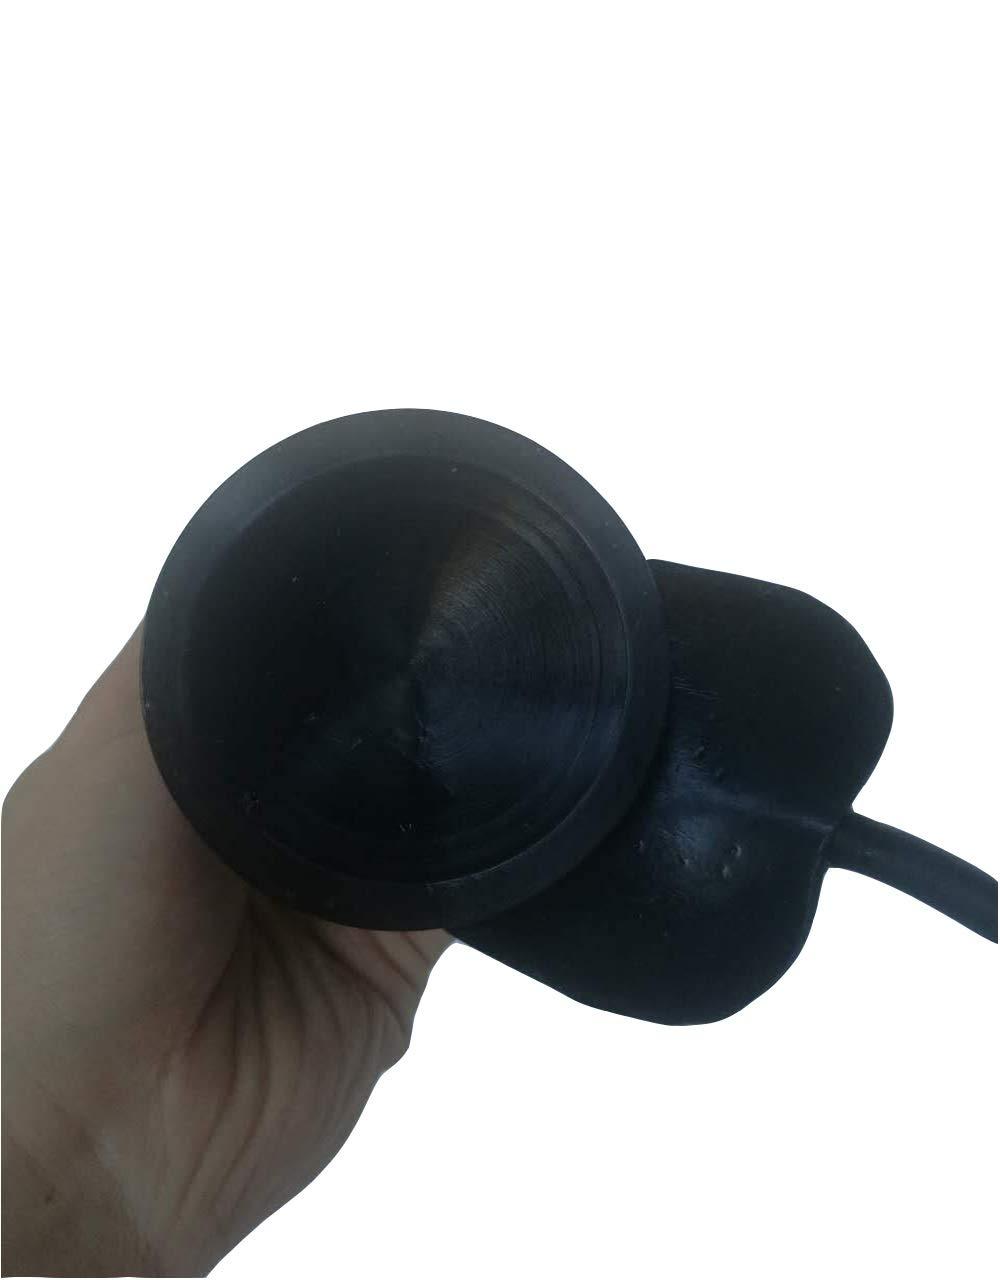 KZKZDZT Liszh 8in Inflatable Oversided S-t-ǐ-mǔ-láté Soft Wand Liszh (Color : Black)